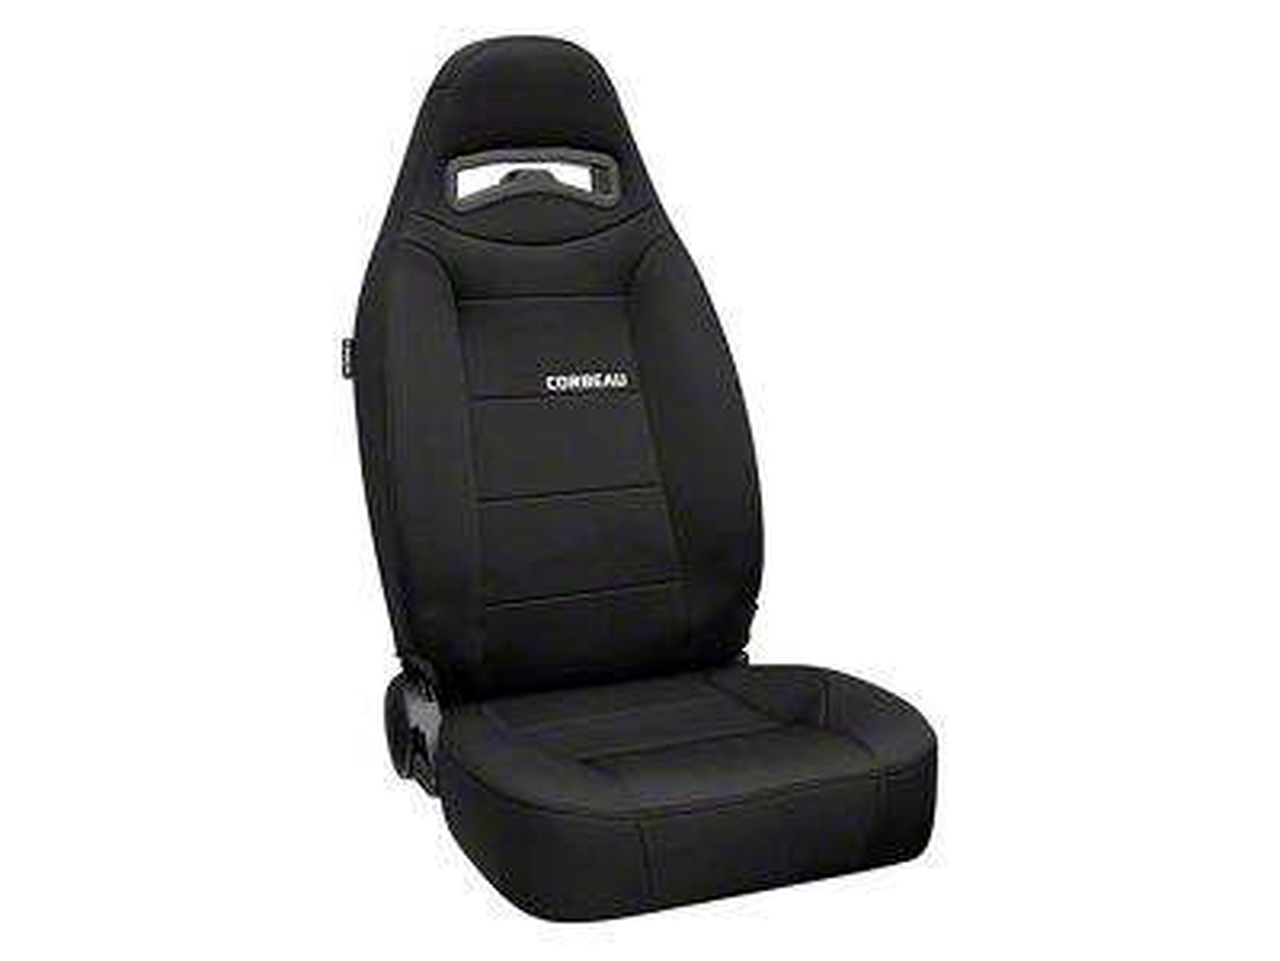 Corbeau Moab Reclining Seat - Black Neoprene - Pair (87-18 Jeep Wrangler YJ, TJ & JK; Seat Brackets are Required for TJ & JK Models)